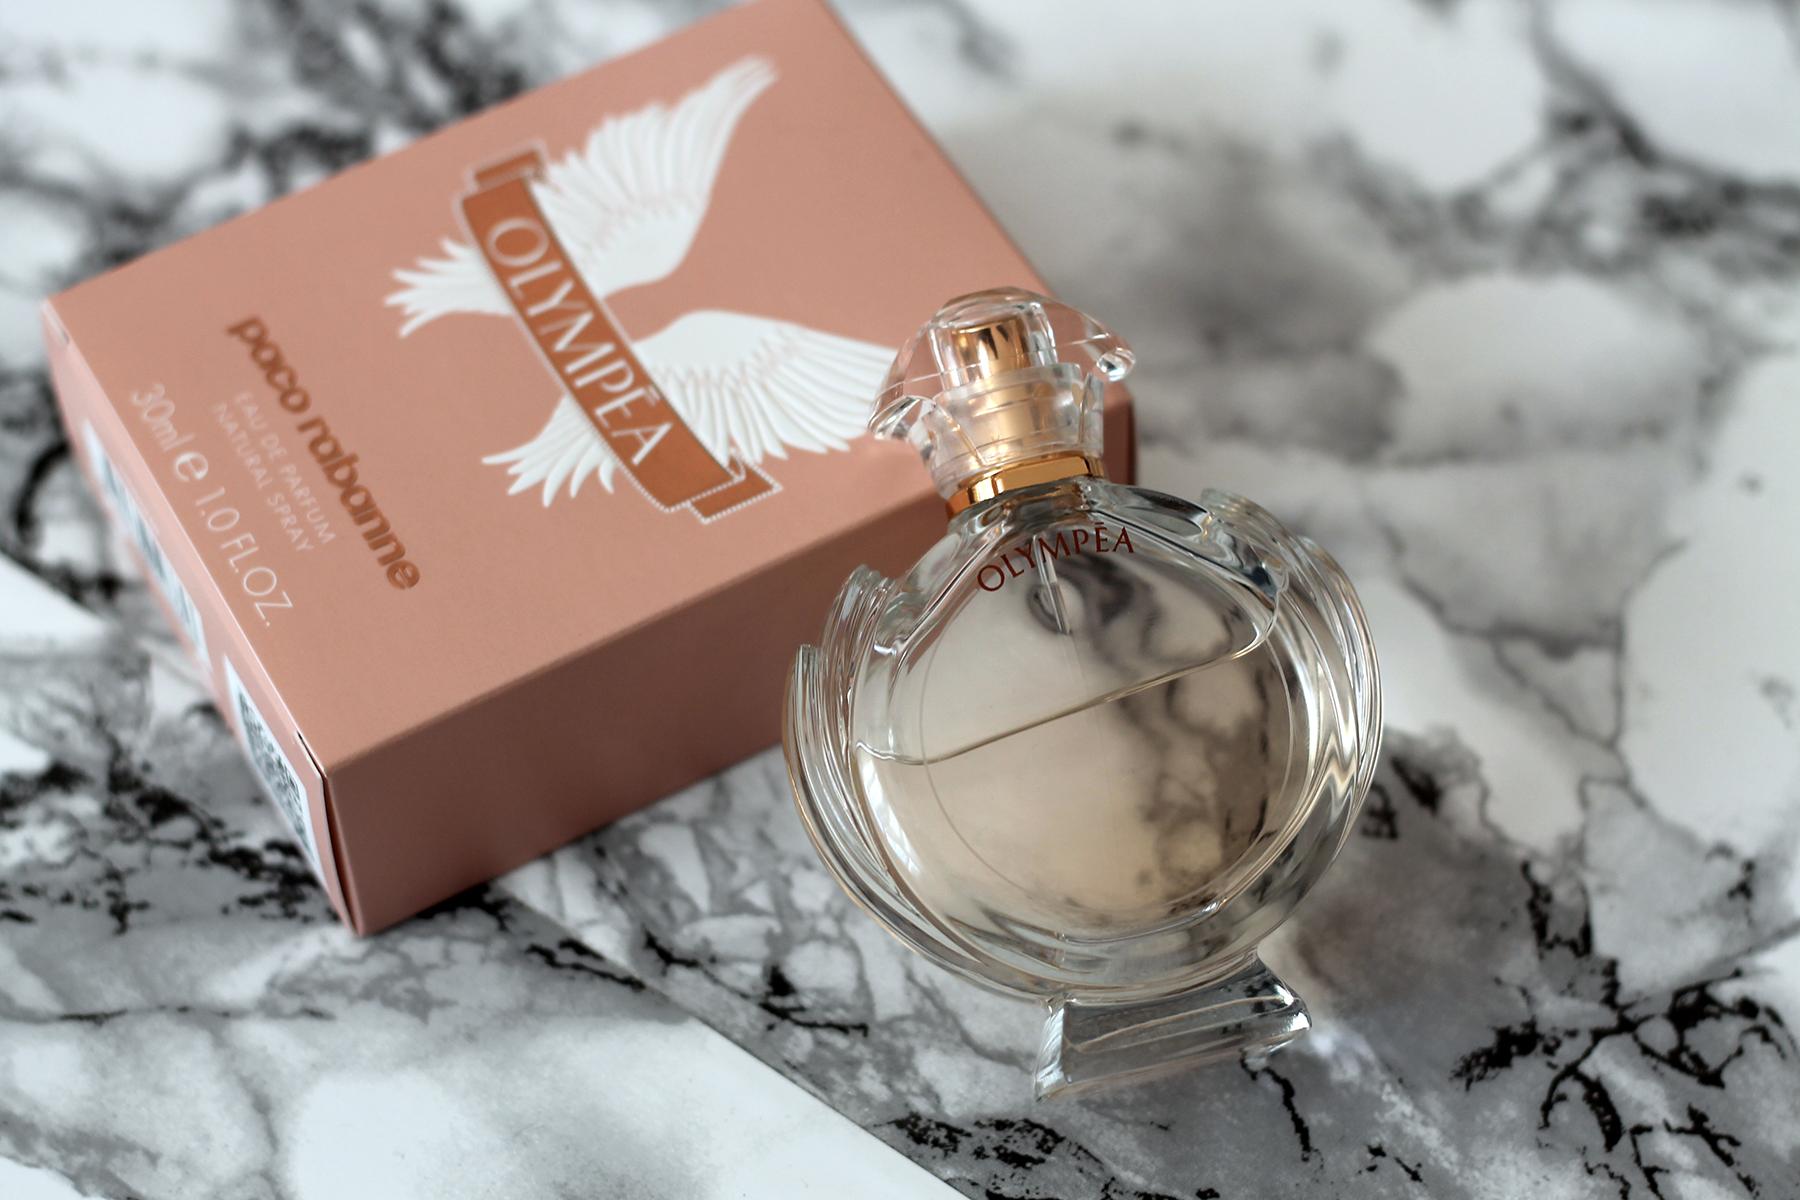 olympea-pacorabanne-duft-parfüm-haul-beautyblog